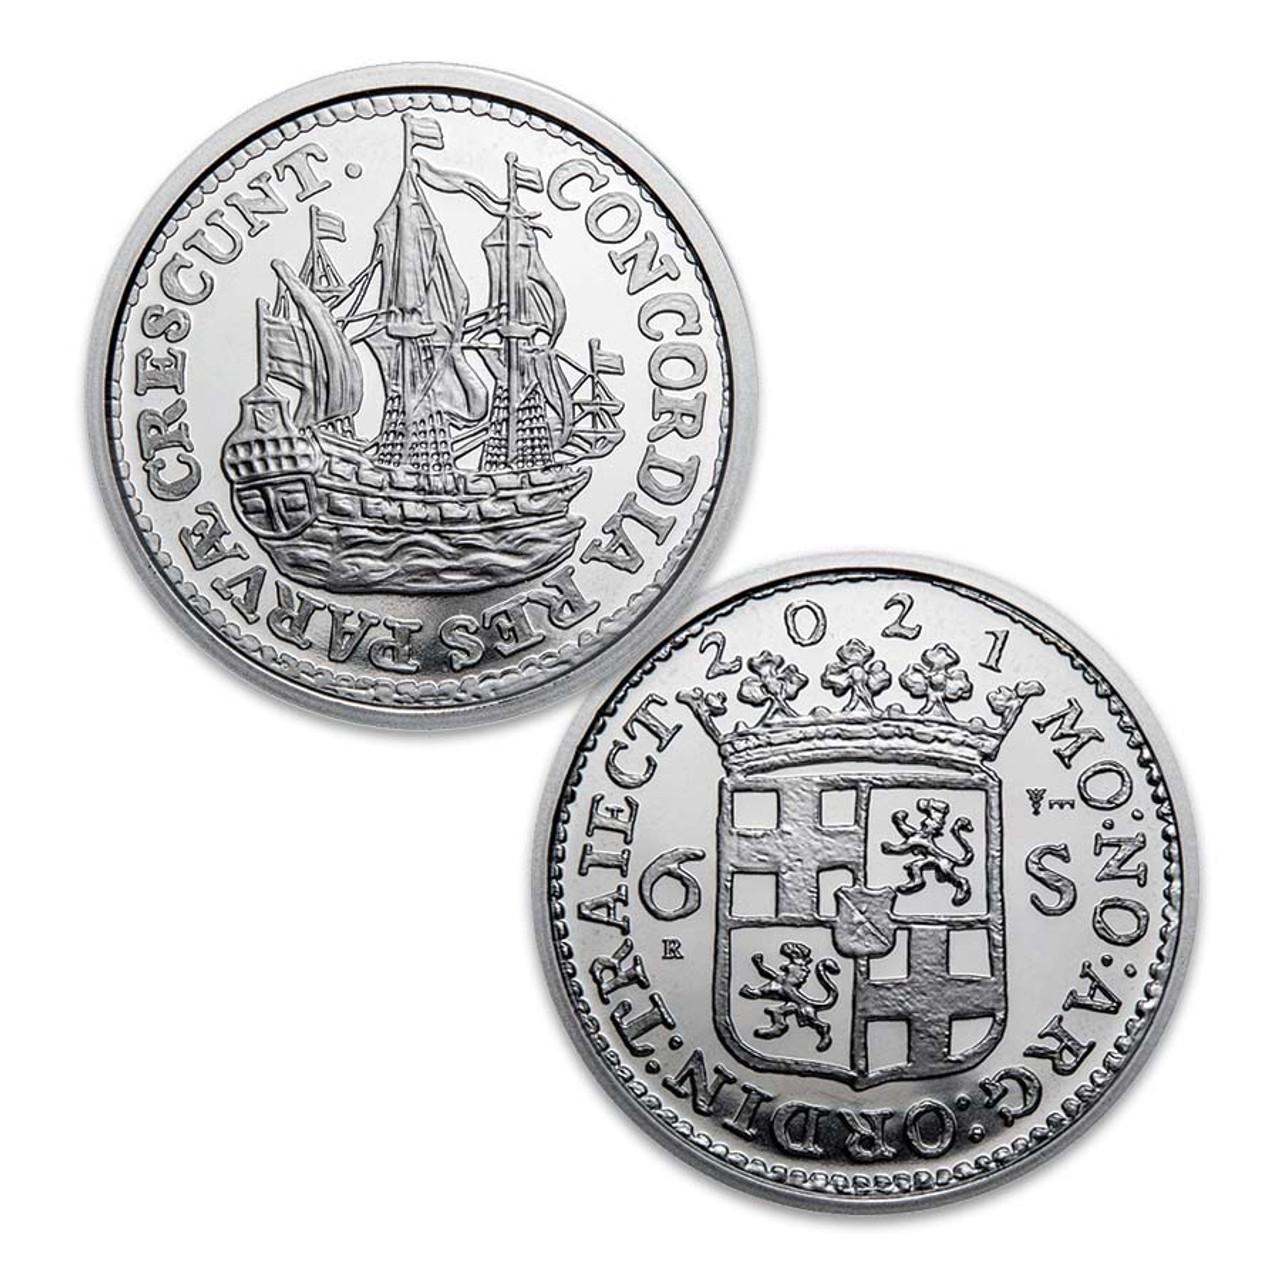 Netherlands 2021 Ship Shilling 1-Oz. Silver Brilliant Uncirculated